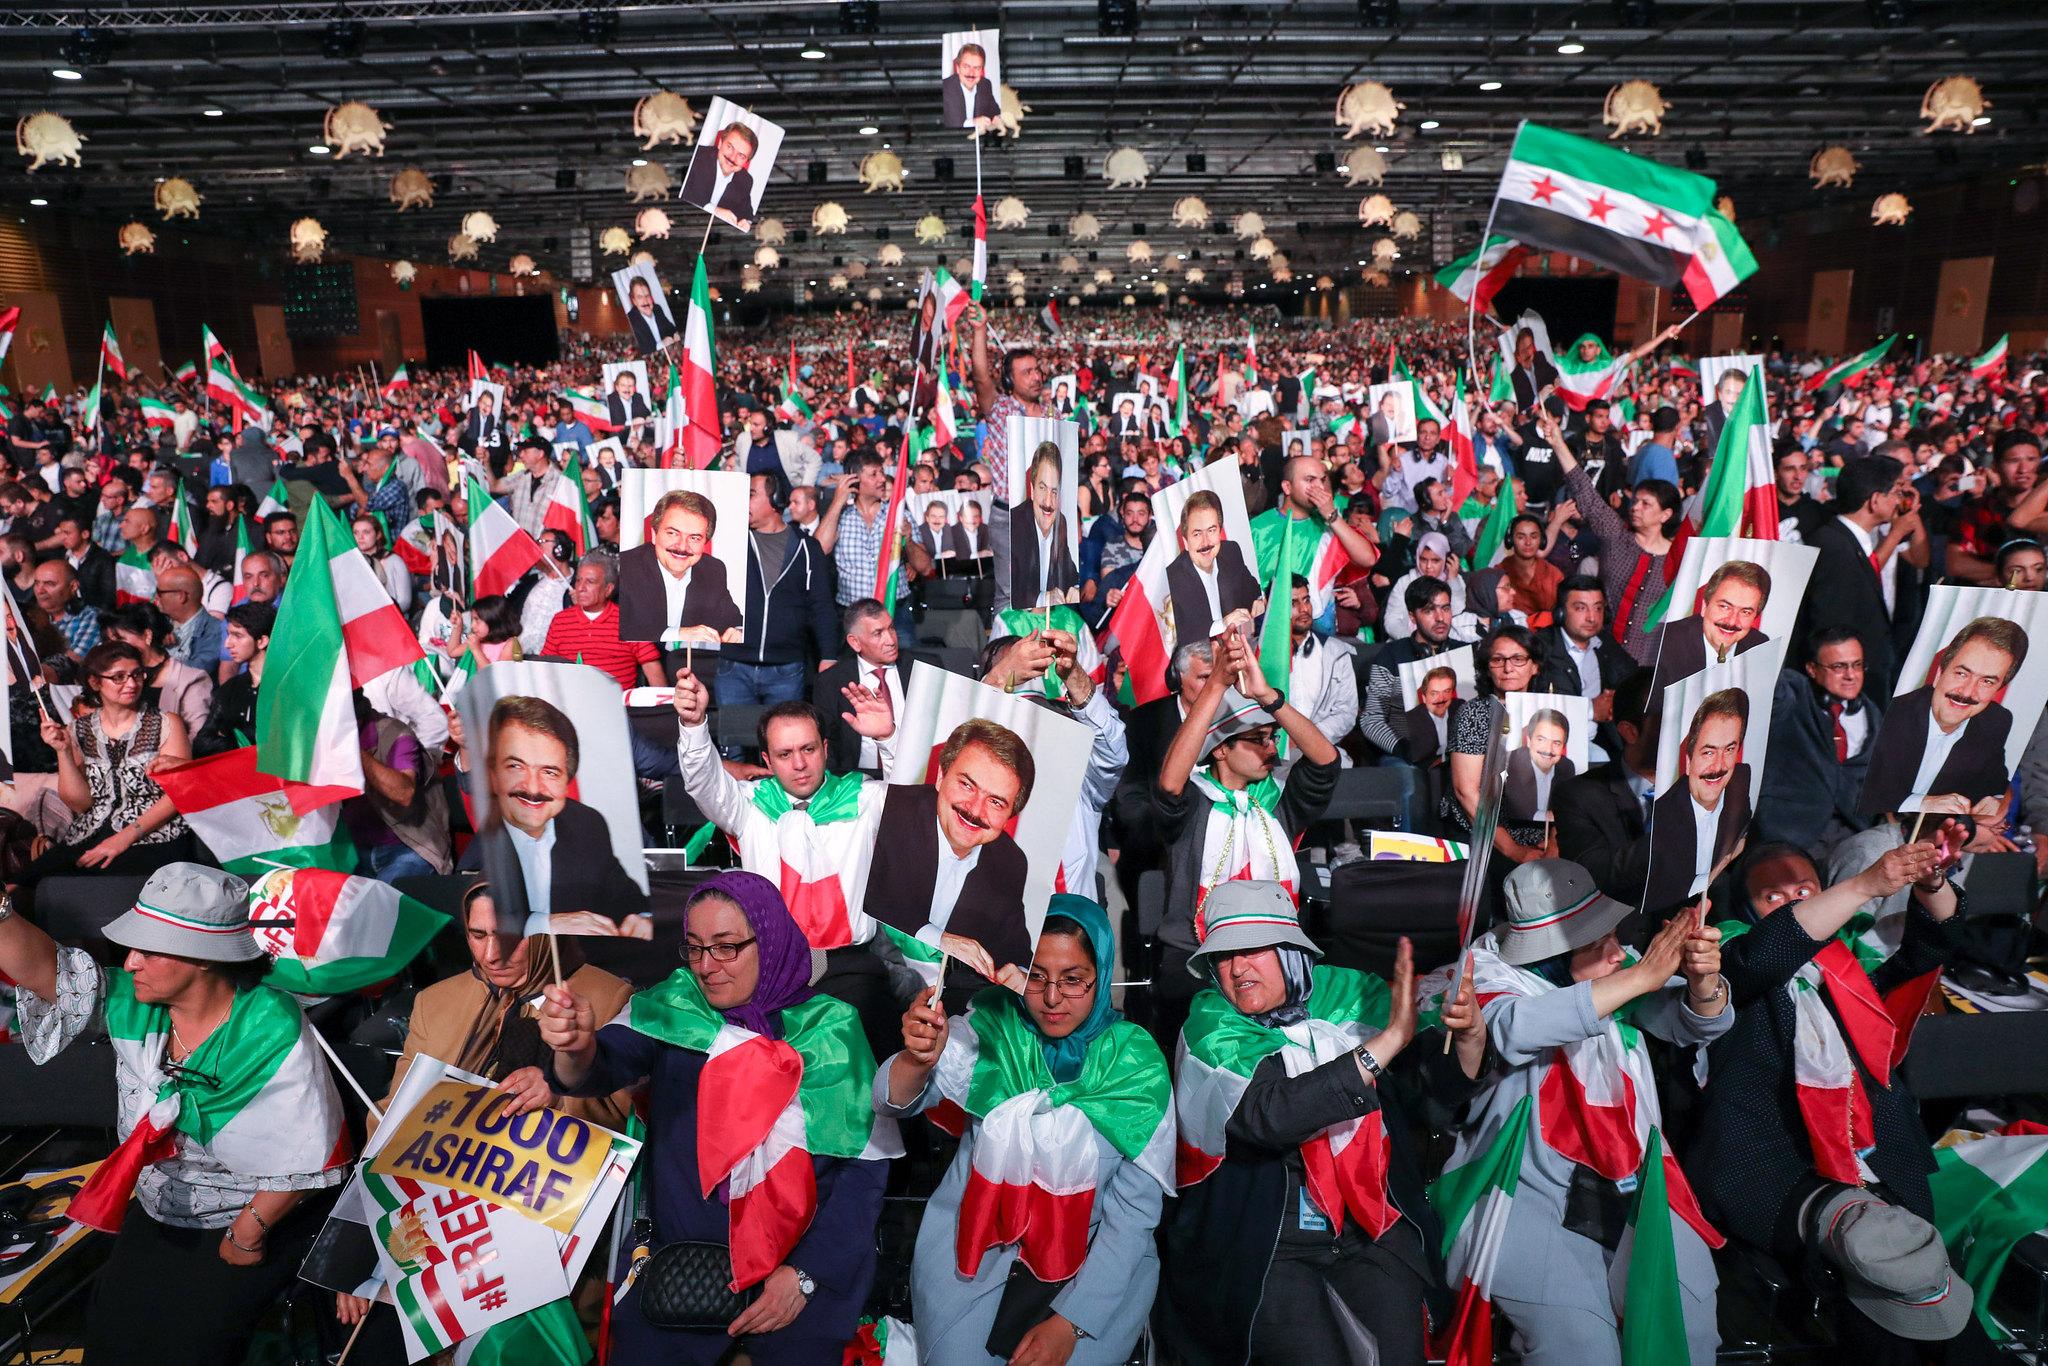 MEK's Resistance Units, Backbone of the Viable Alternative to Iran's Regime